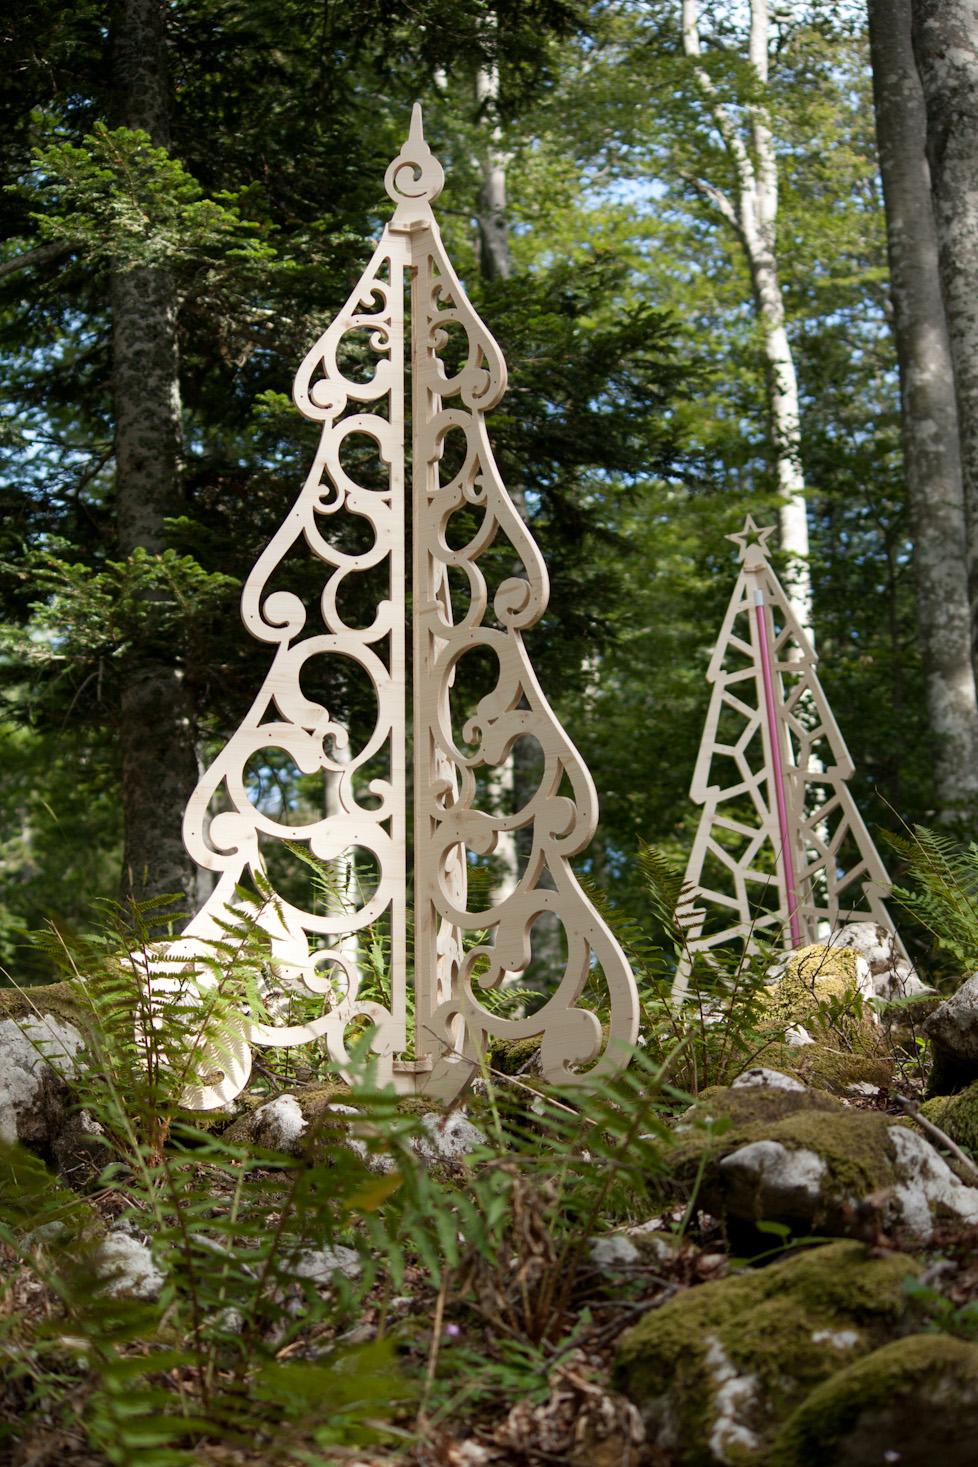 Deco De Noel Originale sapin de noël original barok par splin design